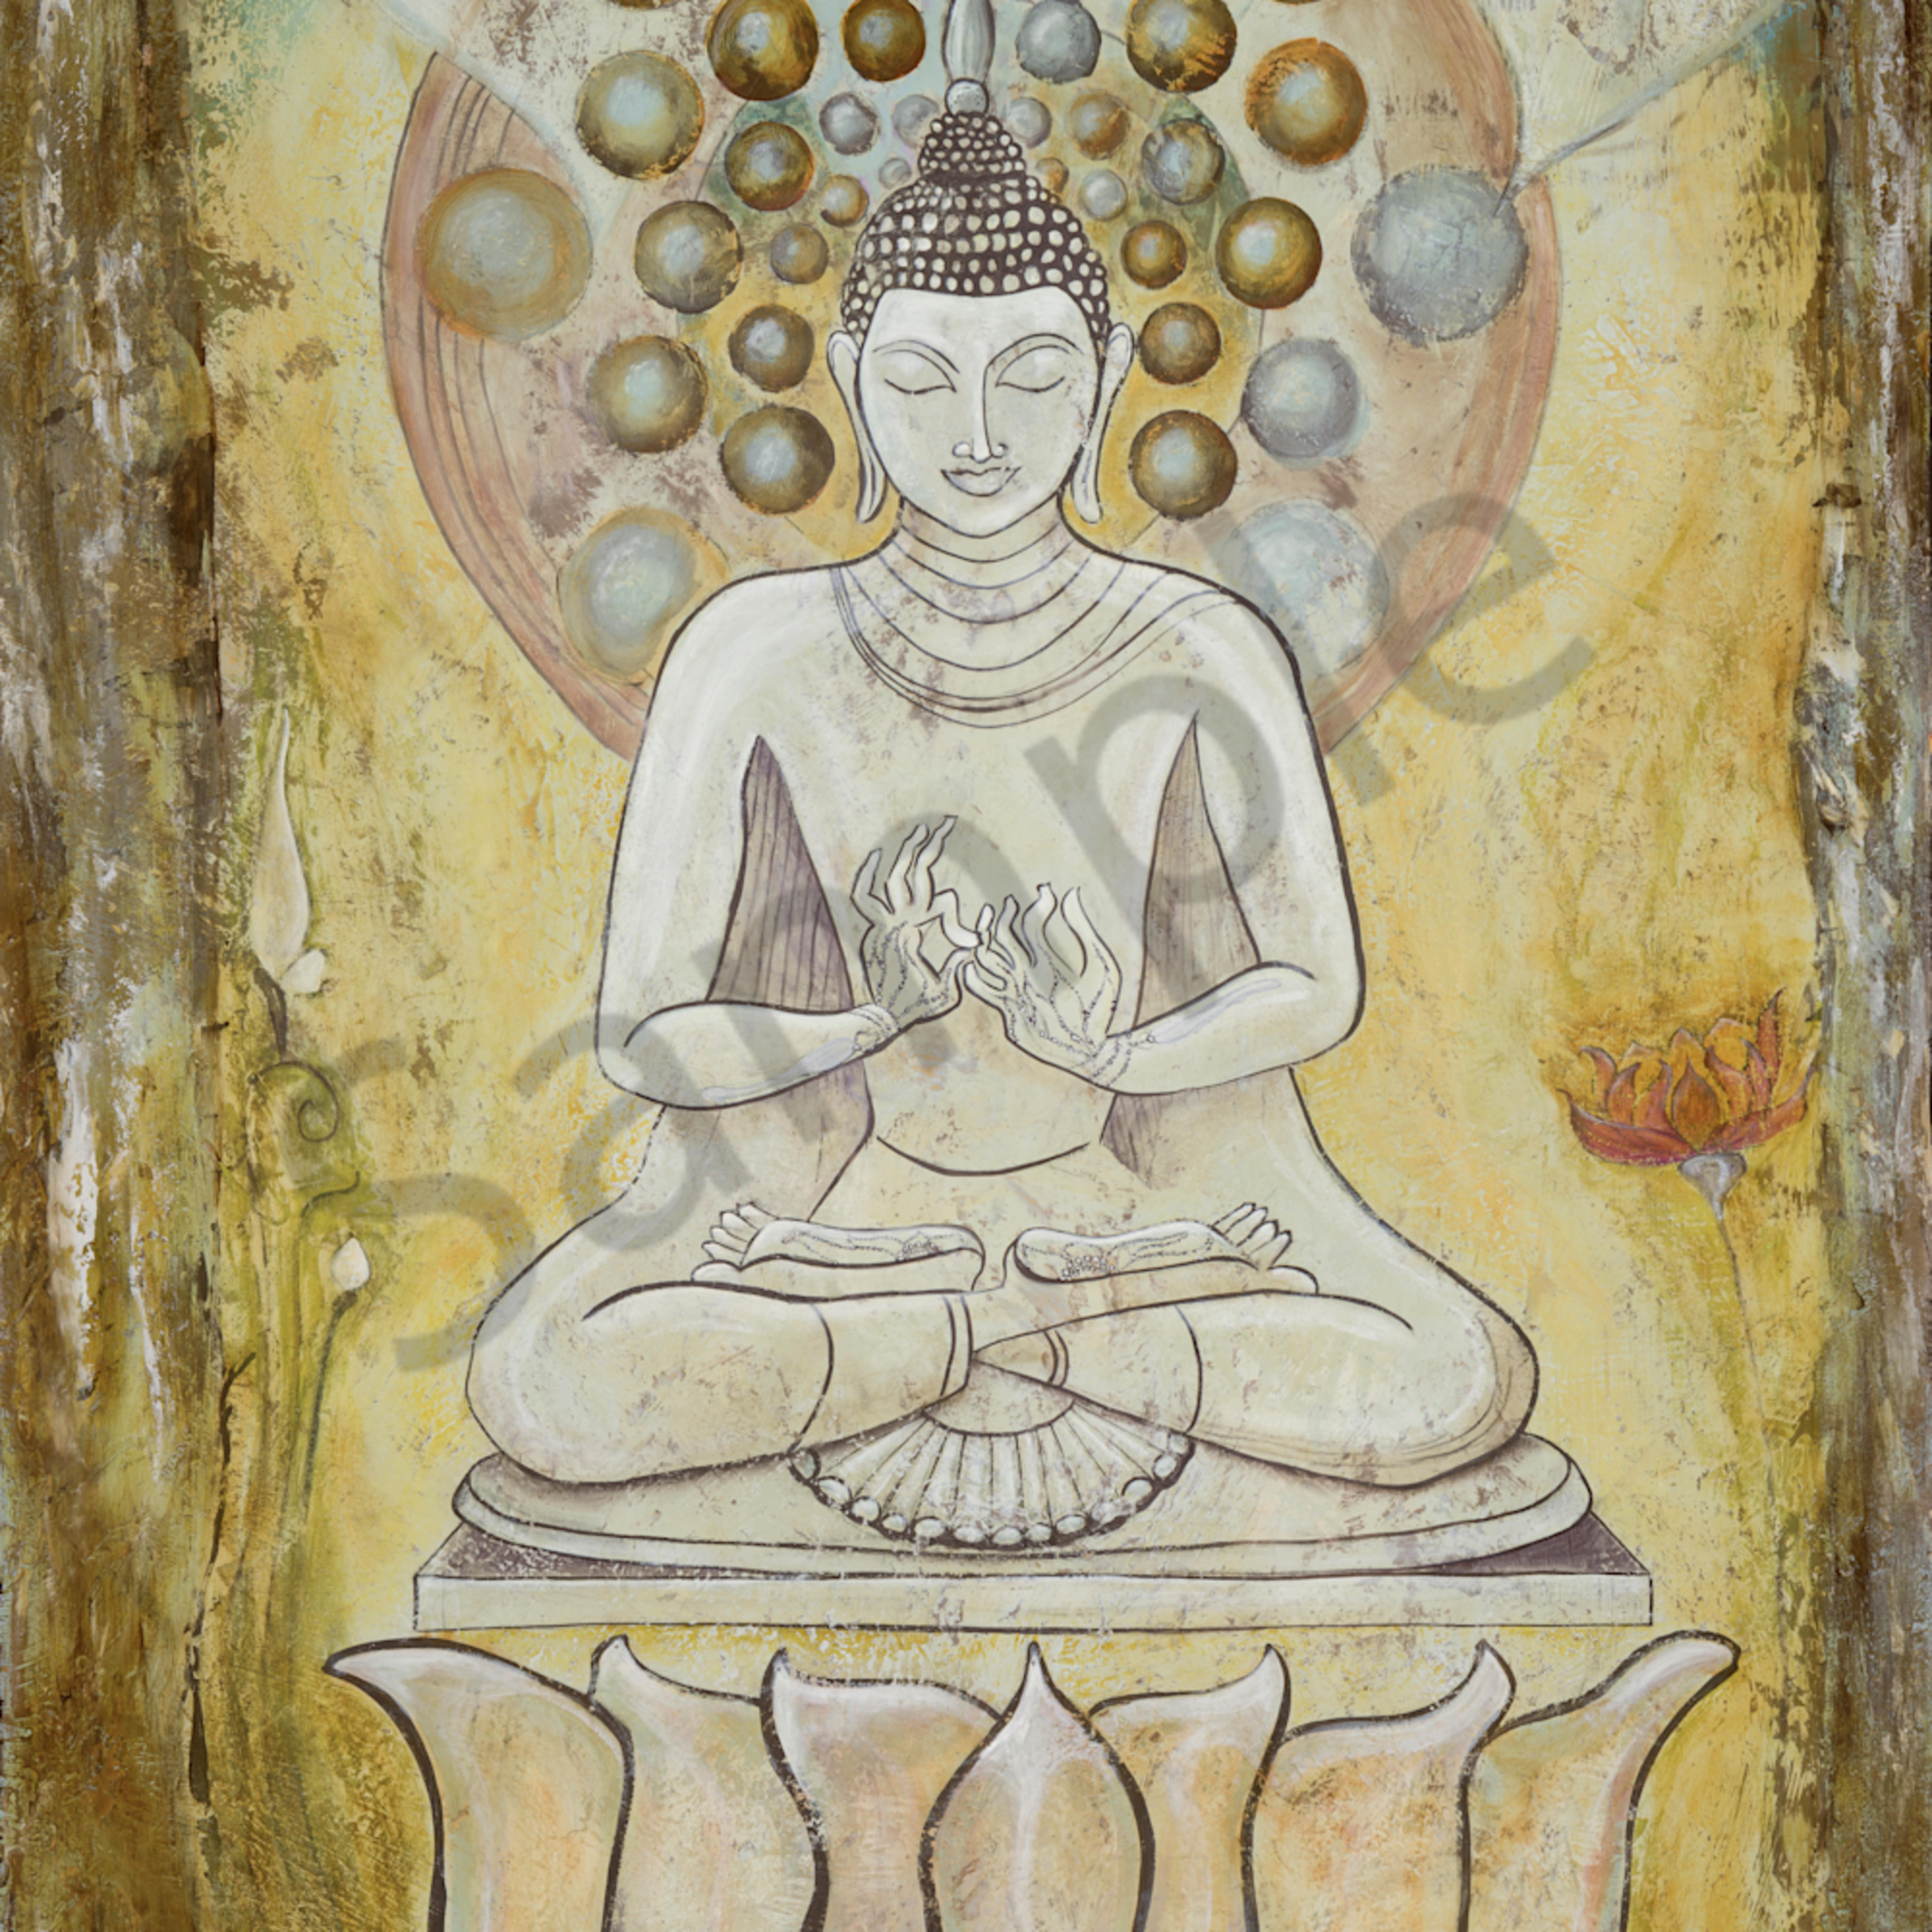 Buddha vkd1lw